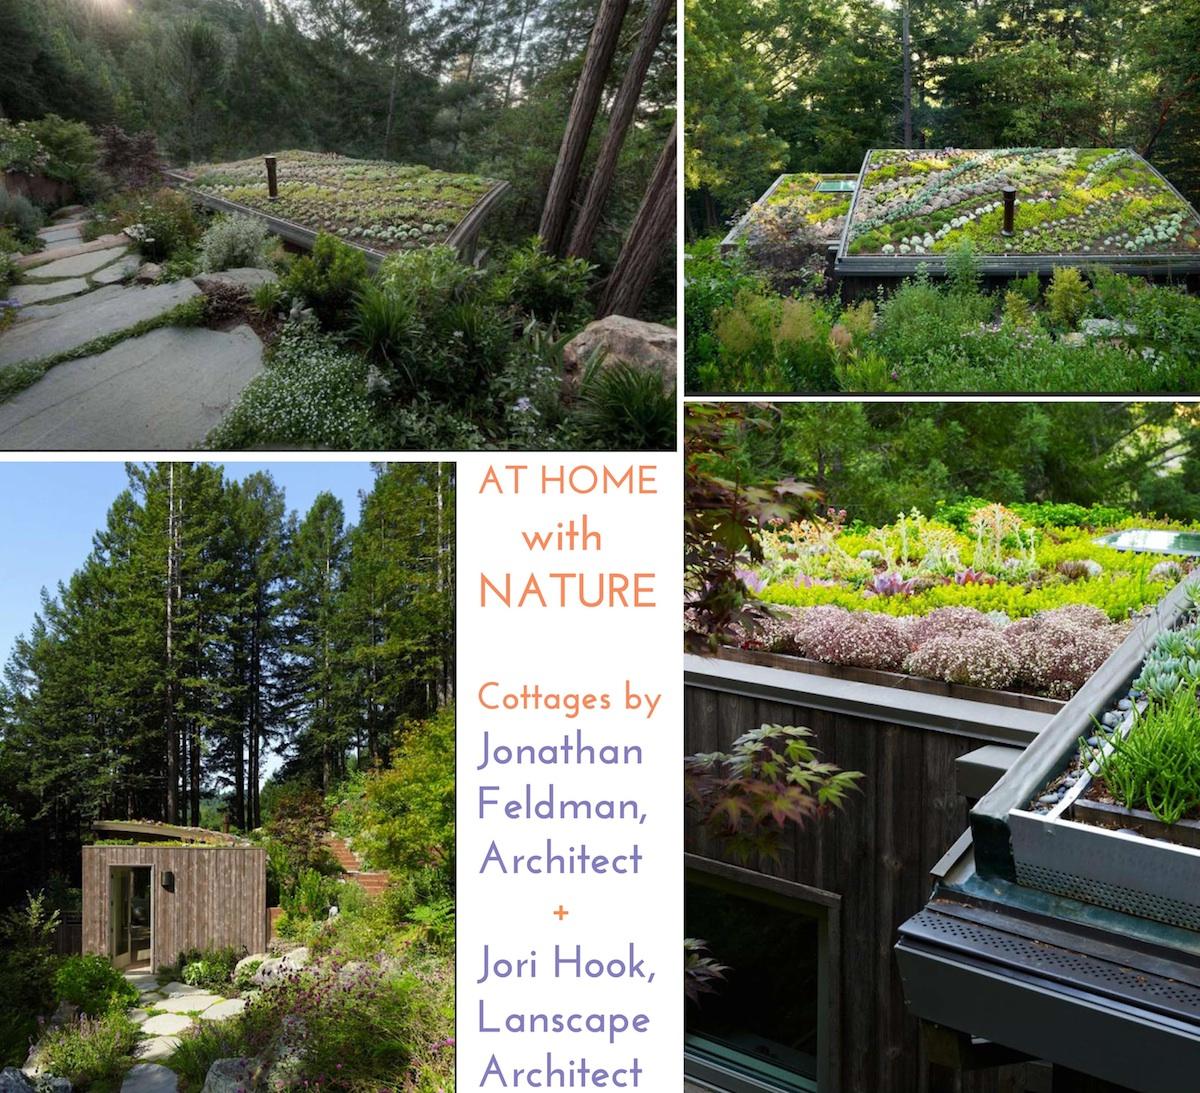 Feldman architect and Jori Hoook landscaper